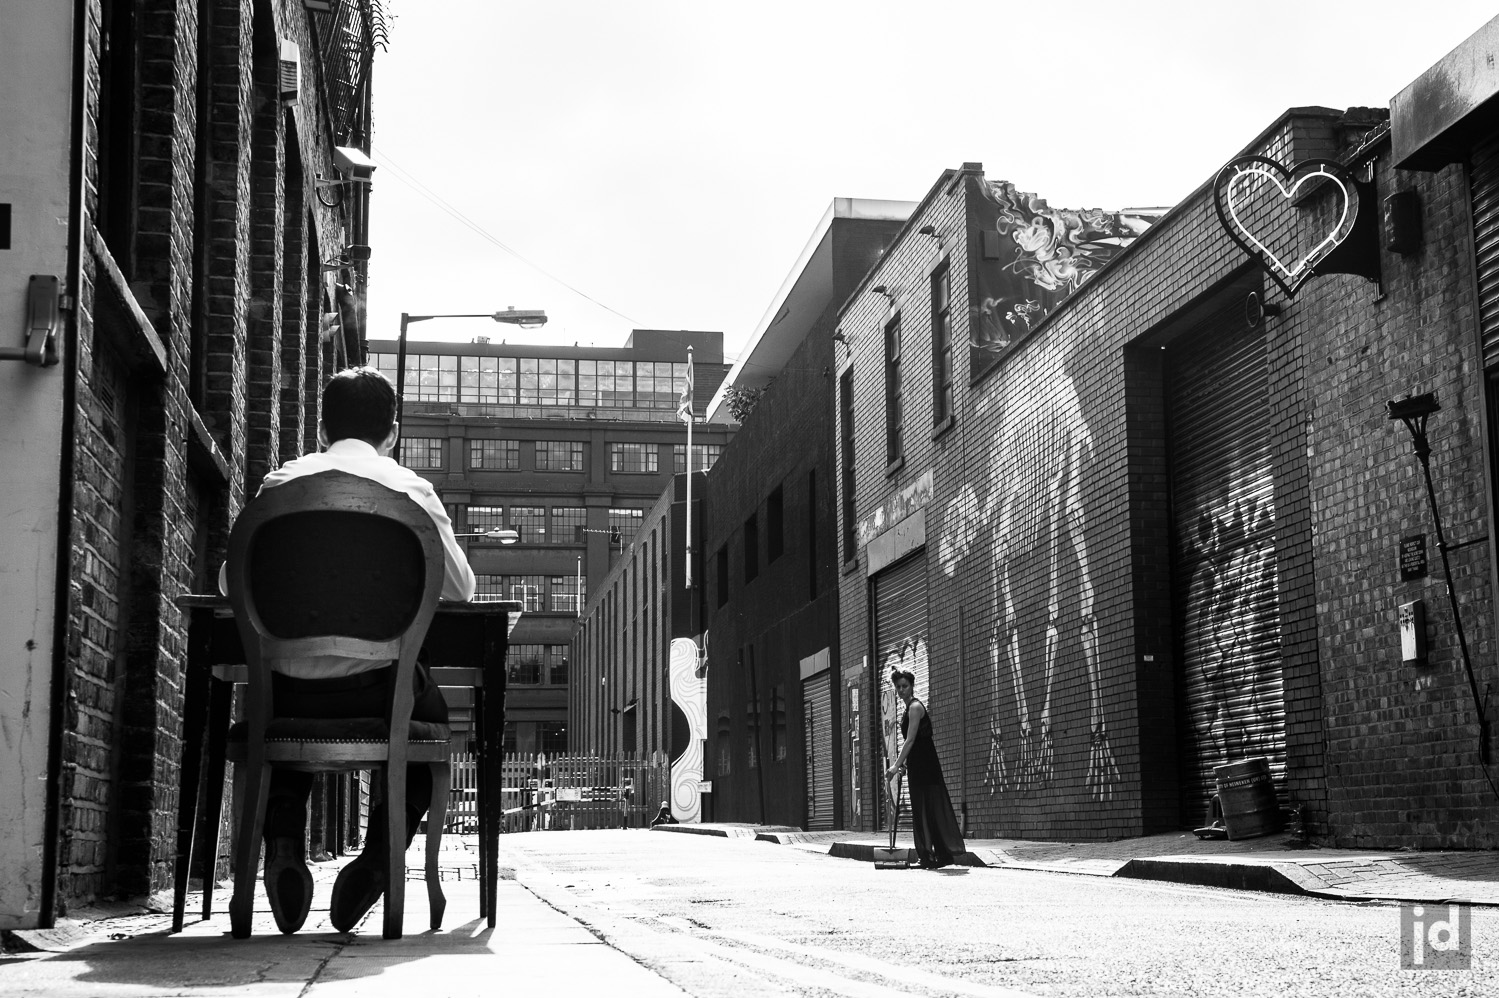 London_Photography_Jason_Davis_Images_022.jpg